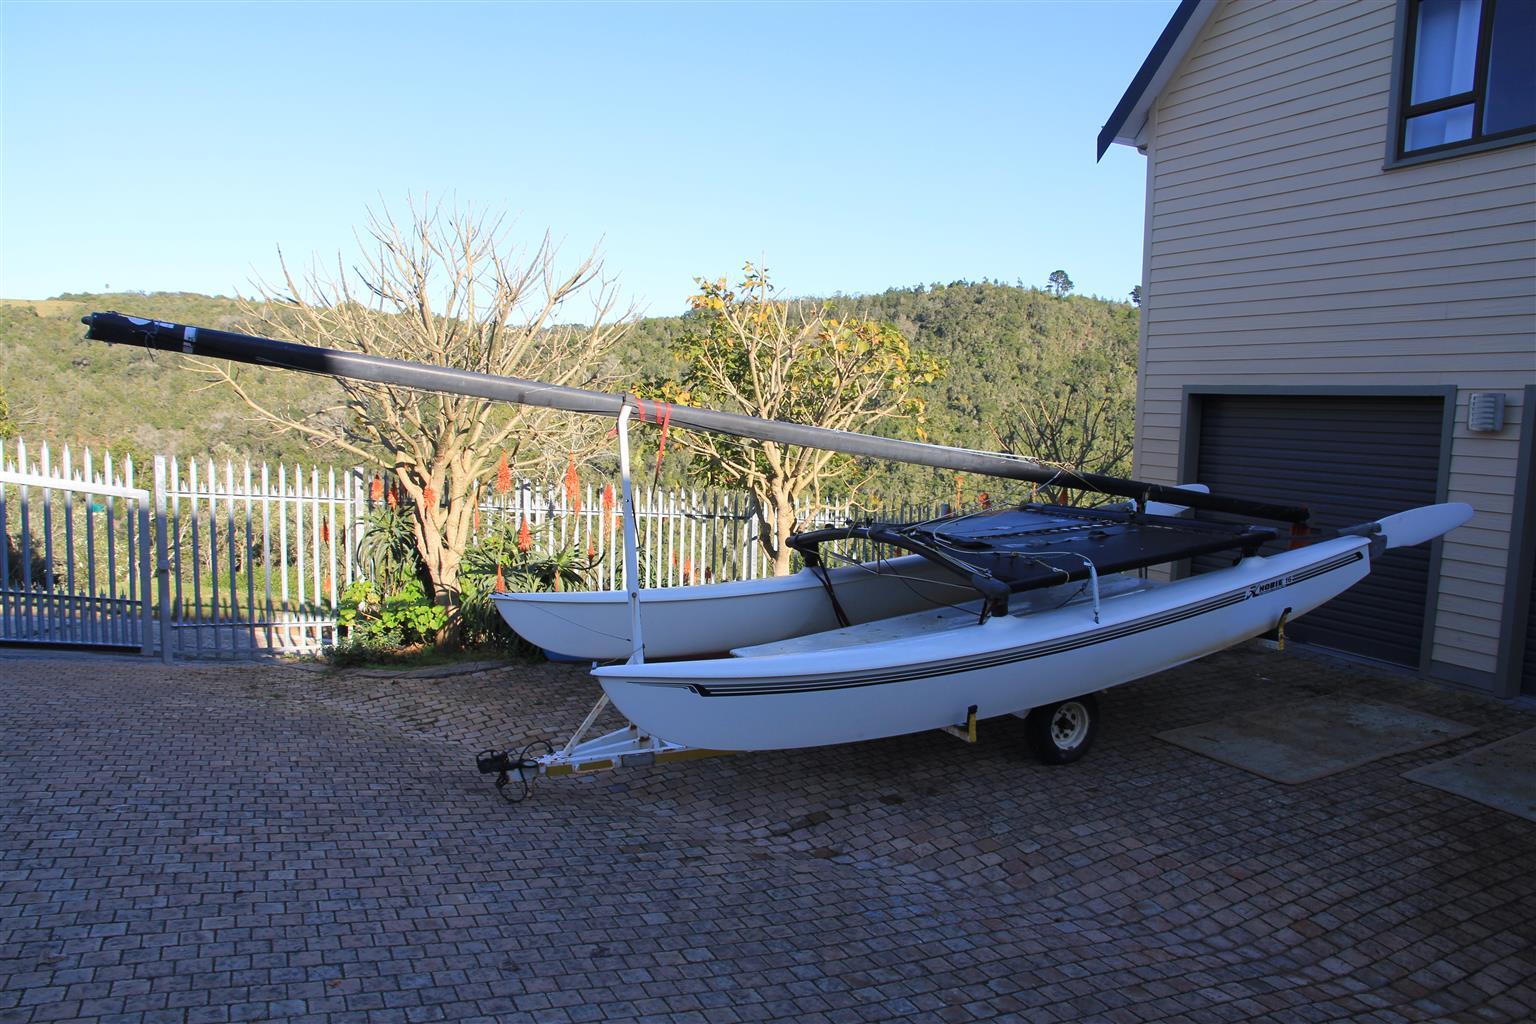 Hobie 16 catamaran on licensed trailer